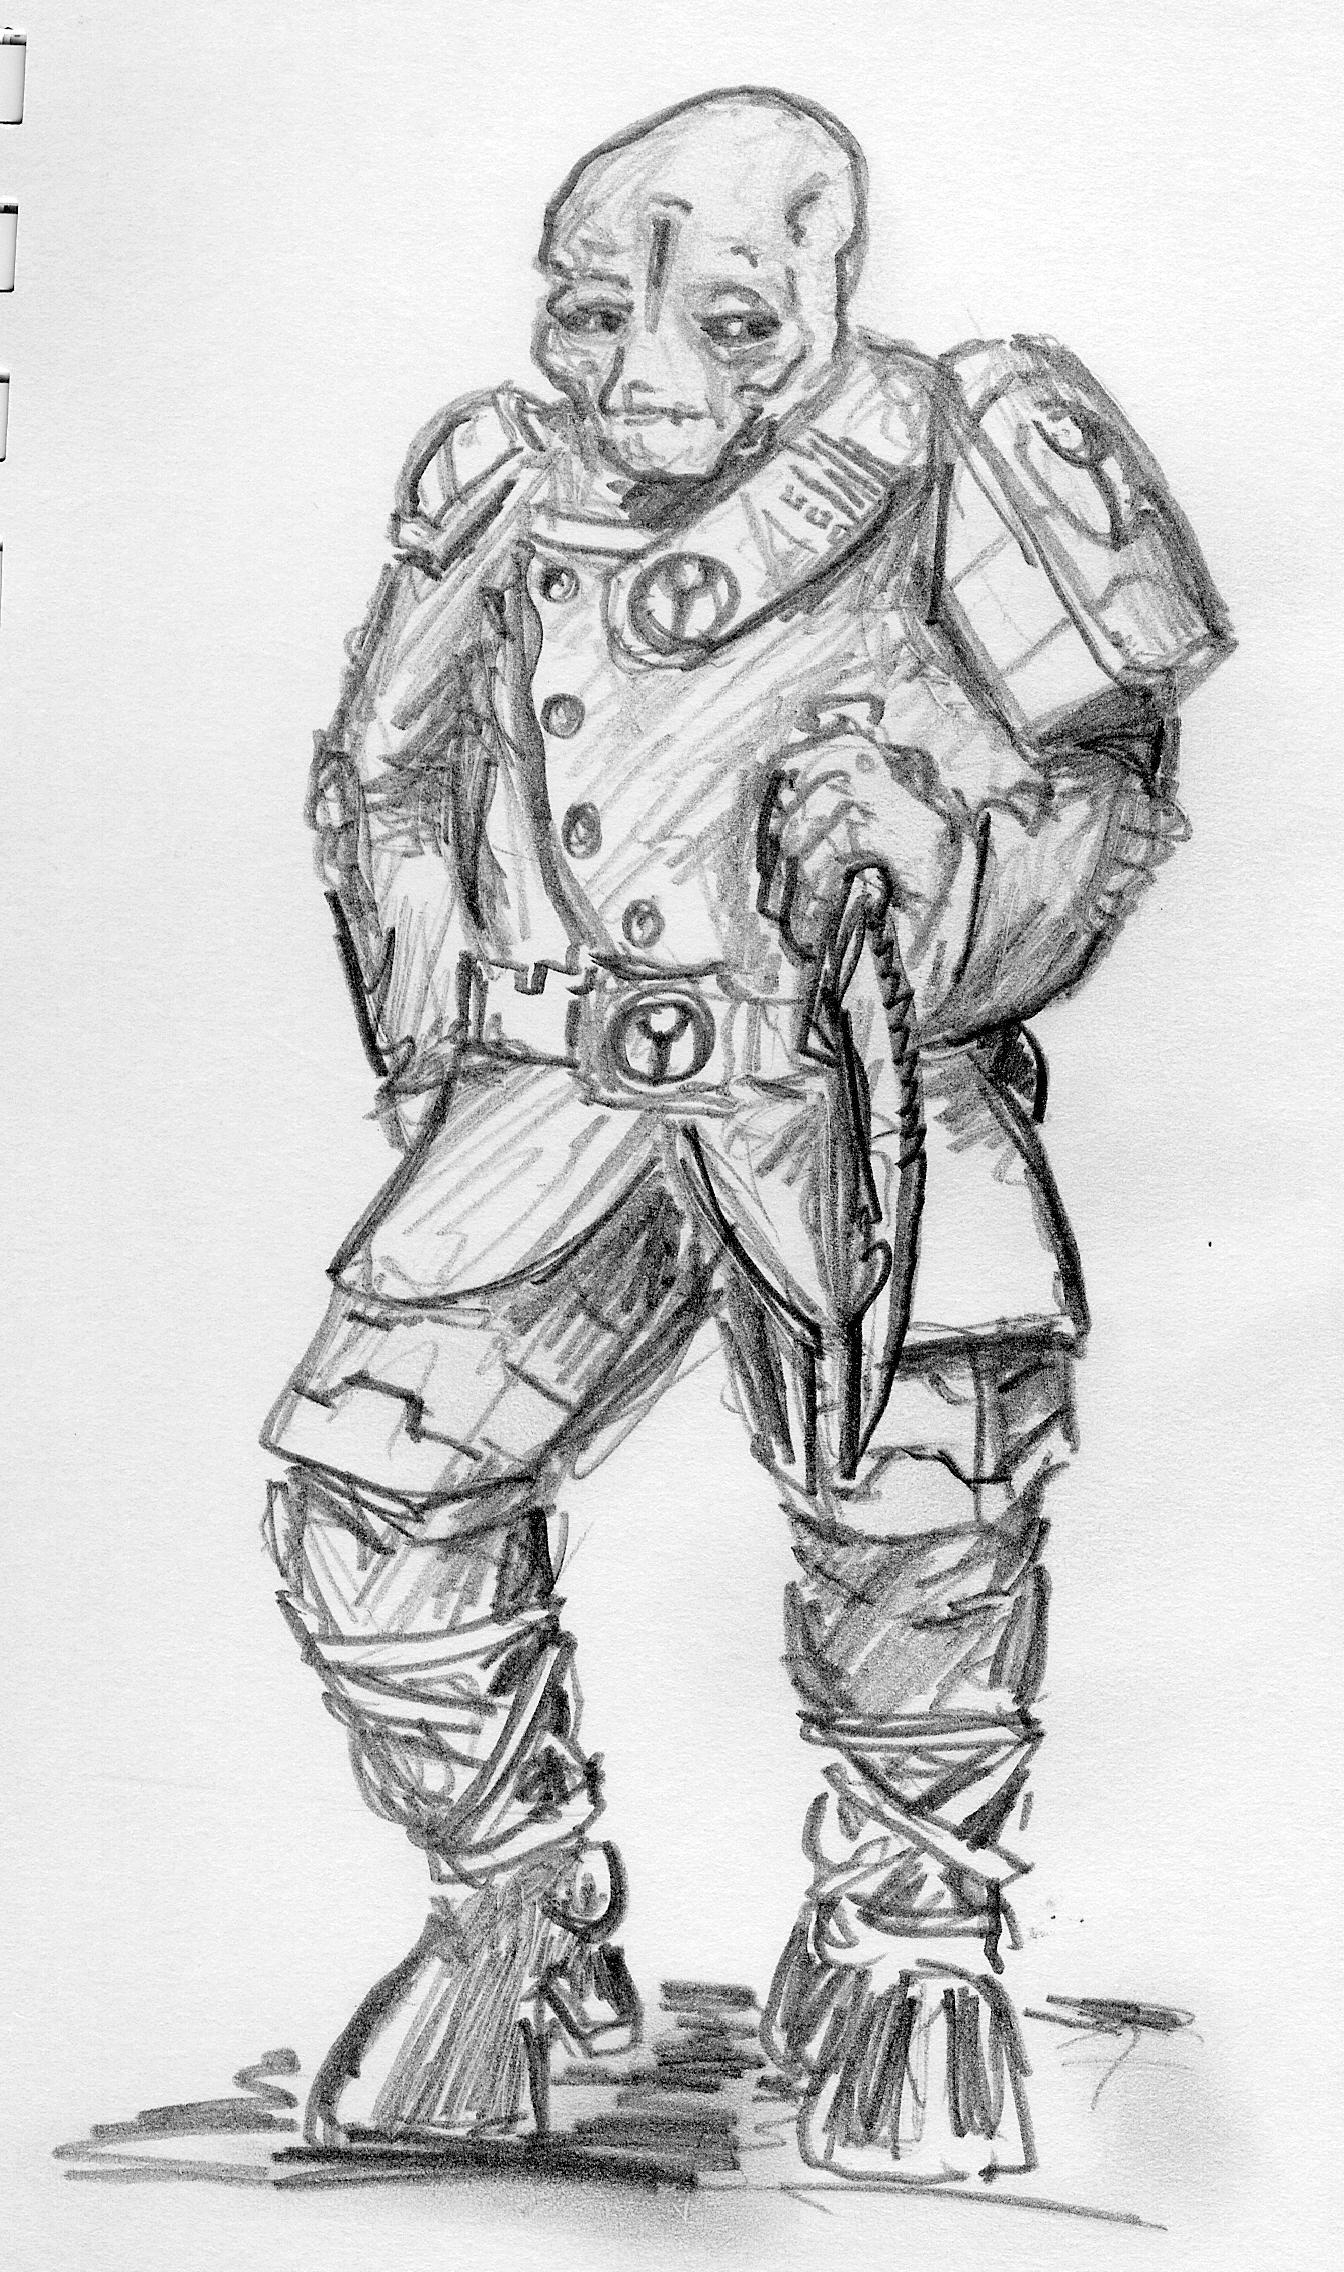 Artwork, Beast, Black Templars, Crisis Battlesuit, Daemons, Drawing, Dreadnought, Mutant, Nurgle, Old, Plague, School, Space Marines, Style, Tau, Warhammer Fantasy